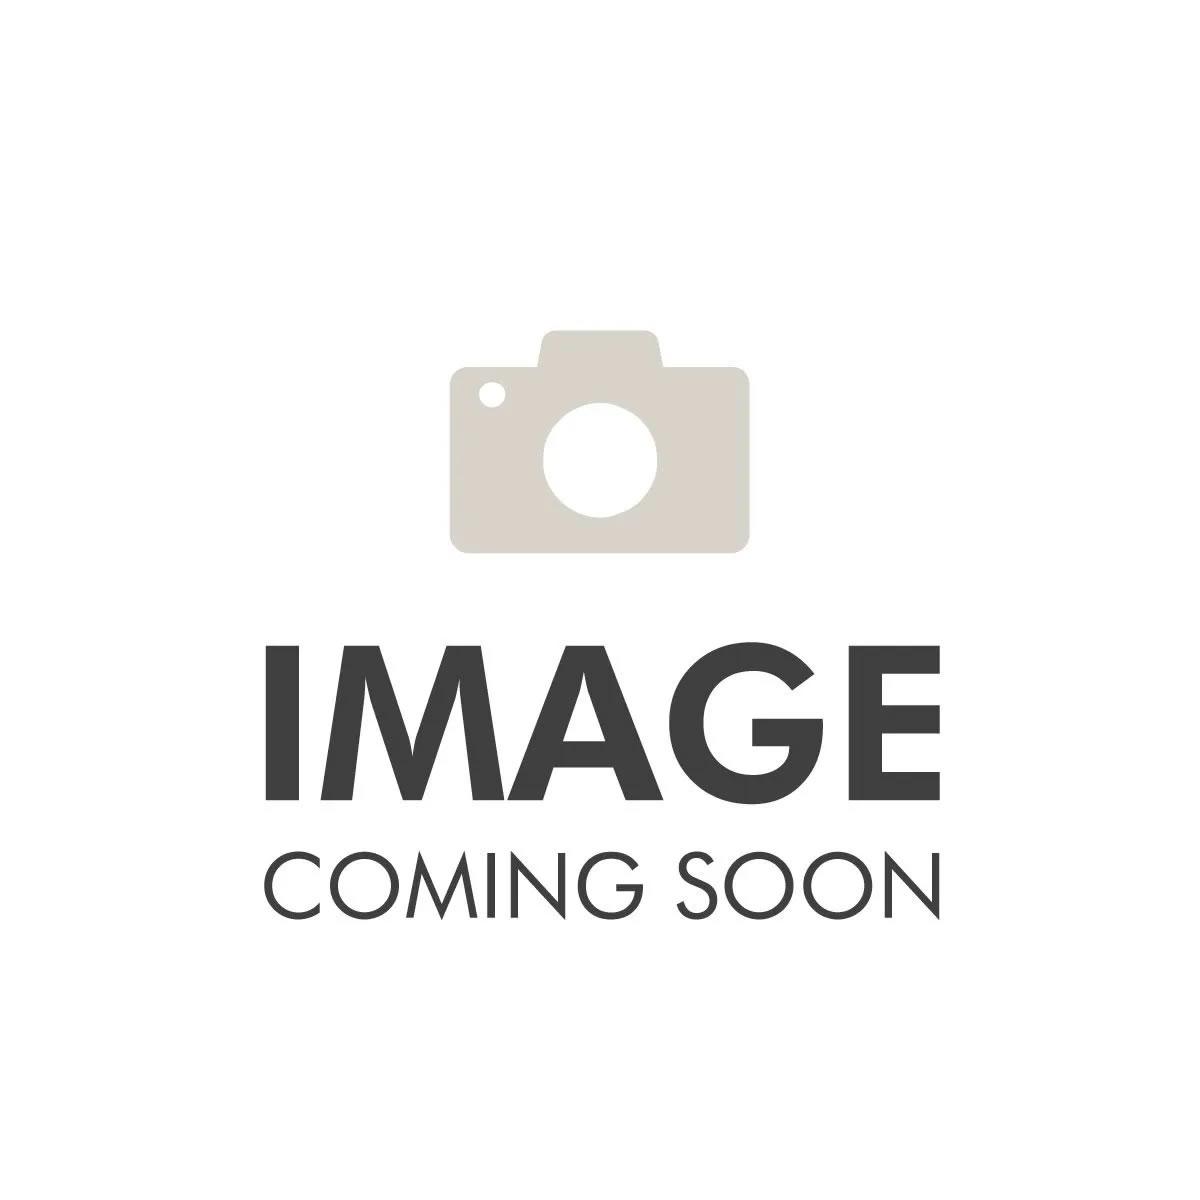 Utv/Atv Standard Recovery Gear Kit